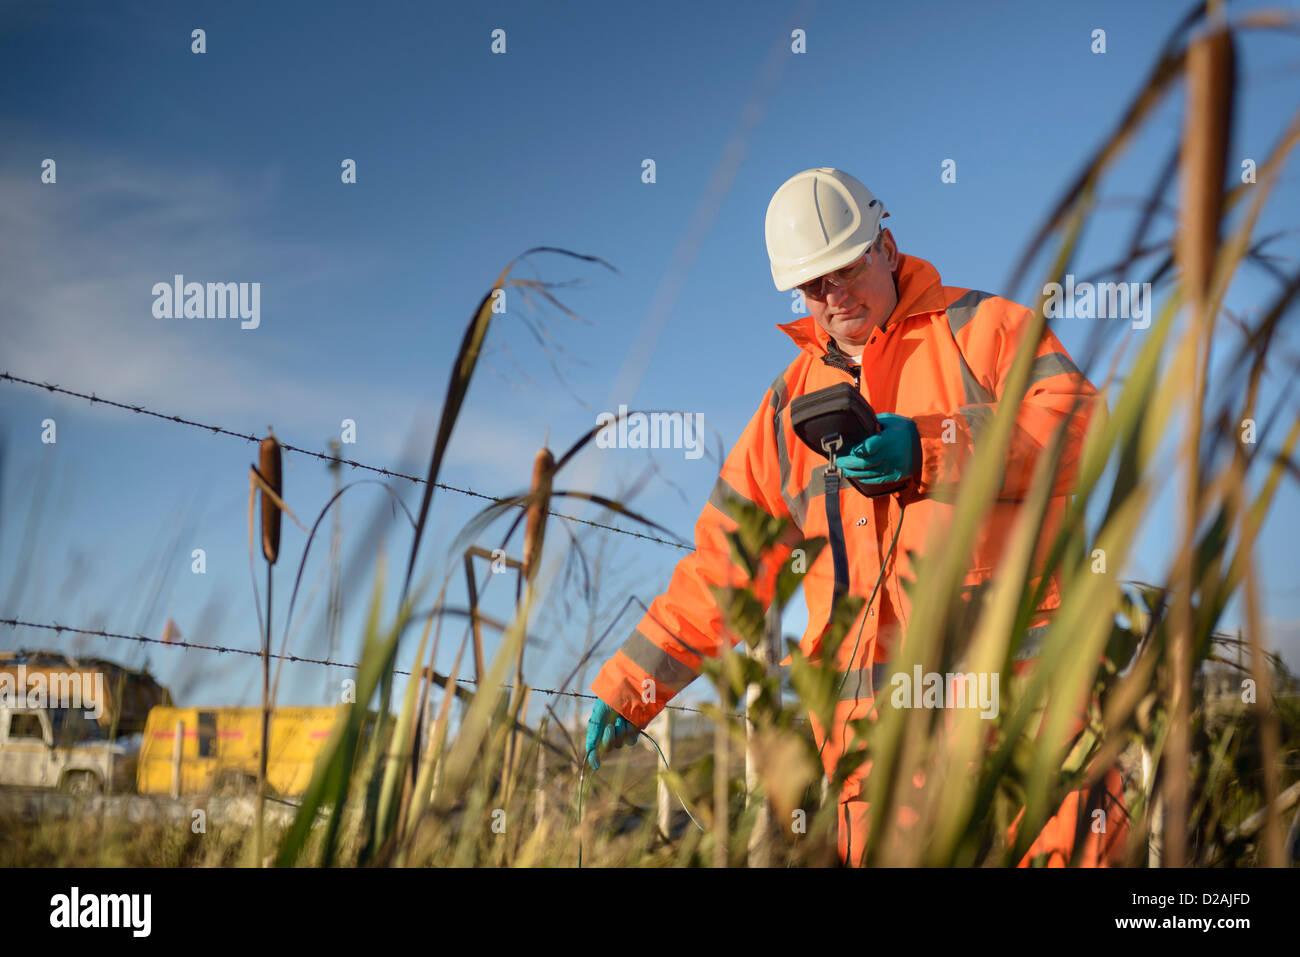 Arbeitnehmer Überwachung Wasser im Kohlebergwerk Stockbild